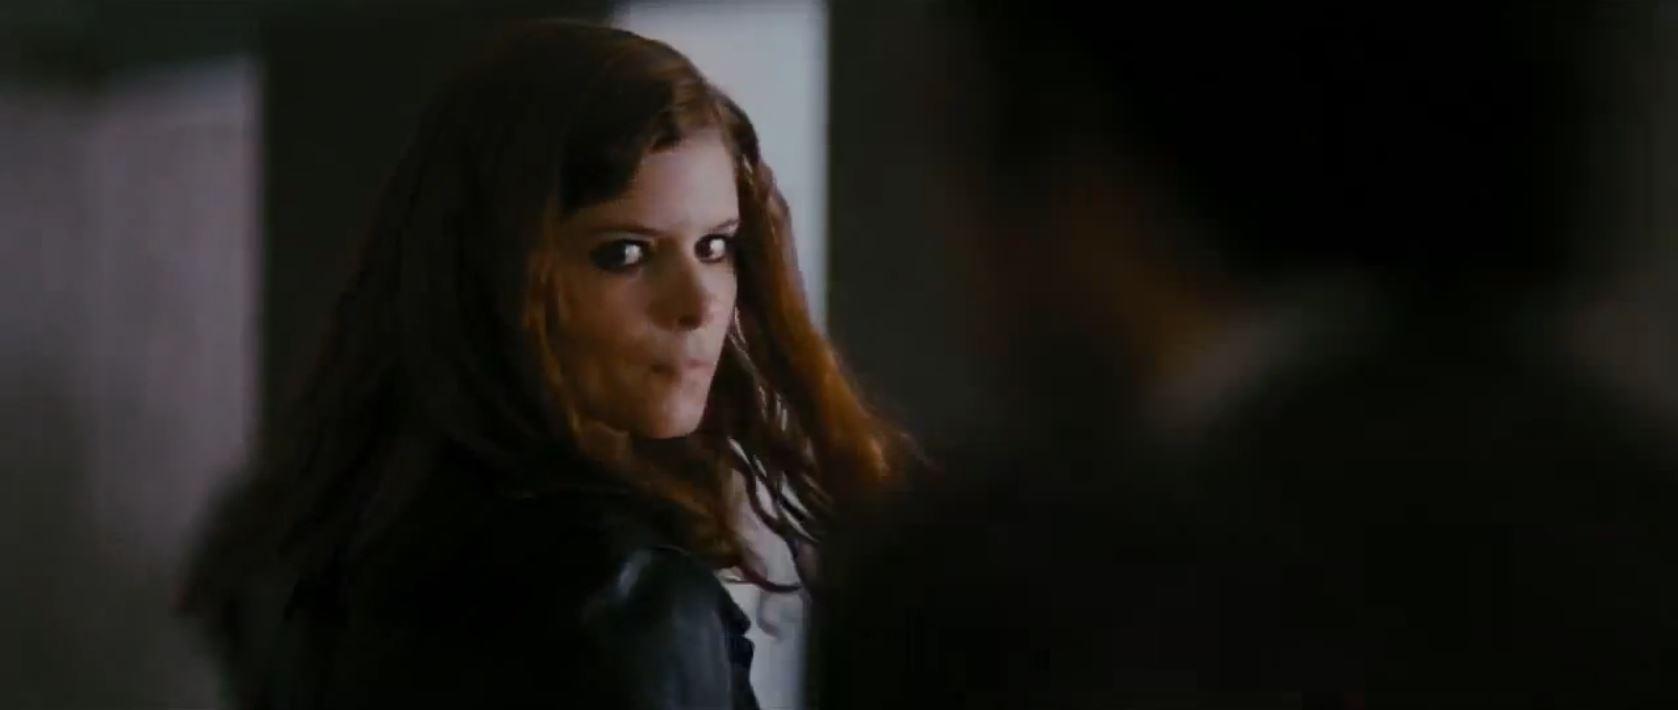 transcendence movie - Kate Mara as Bree